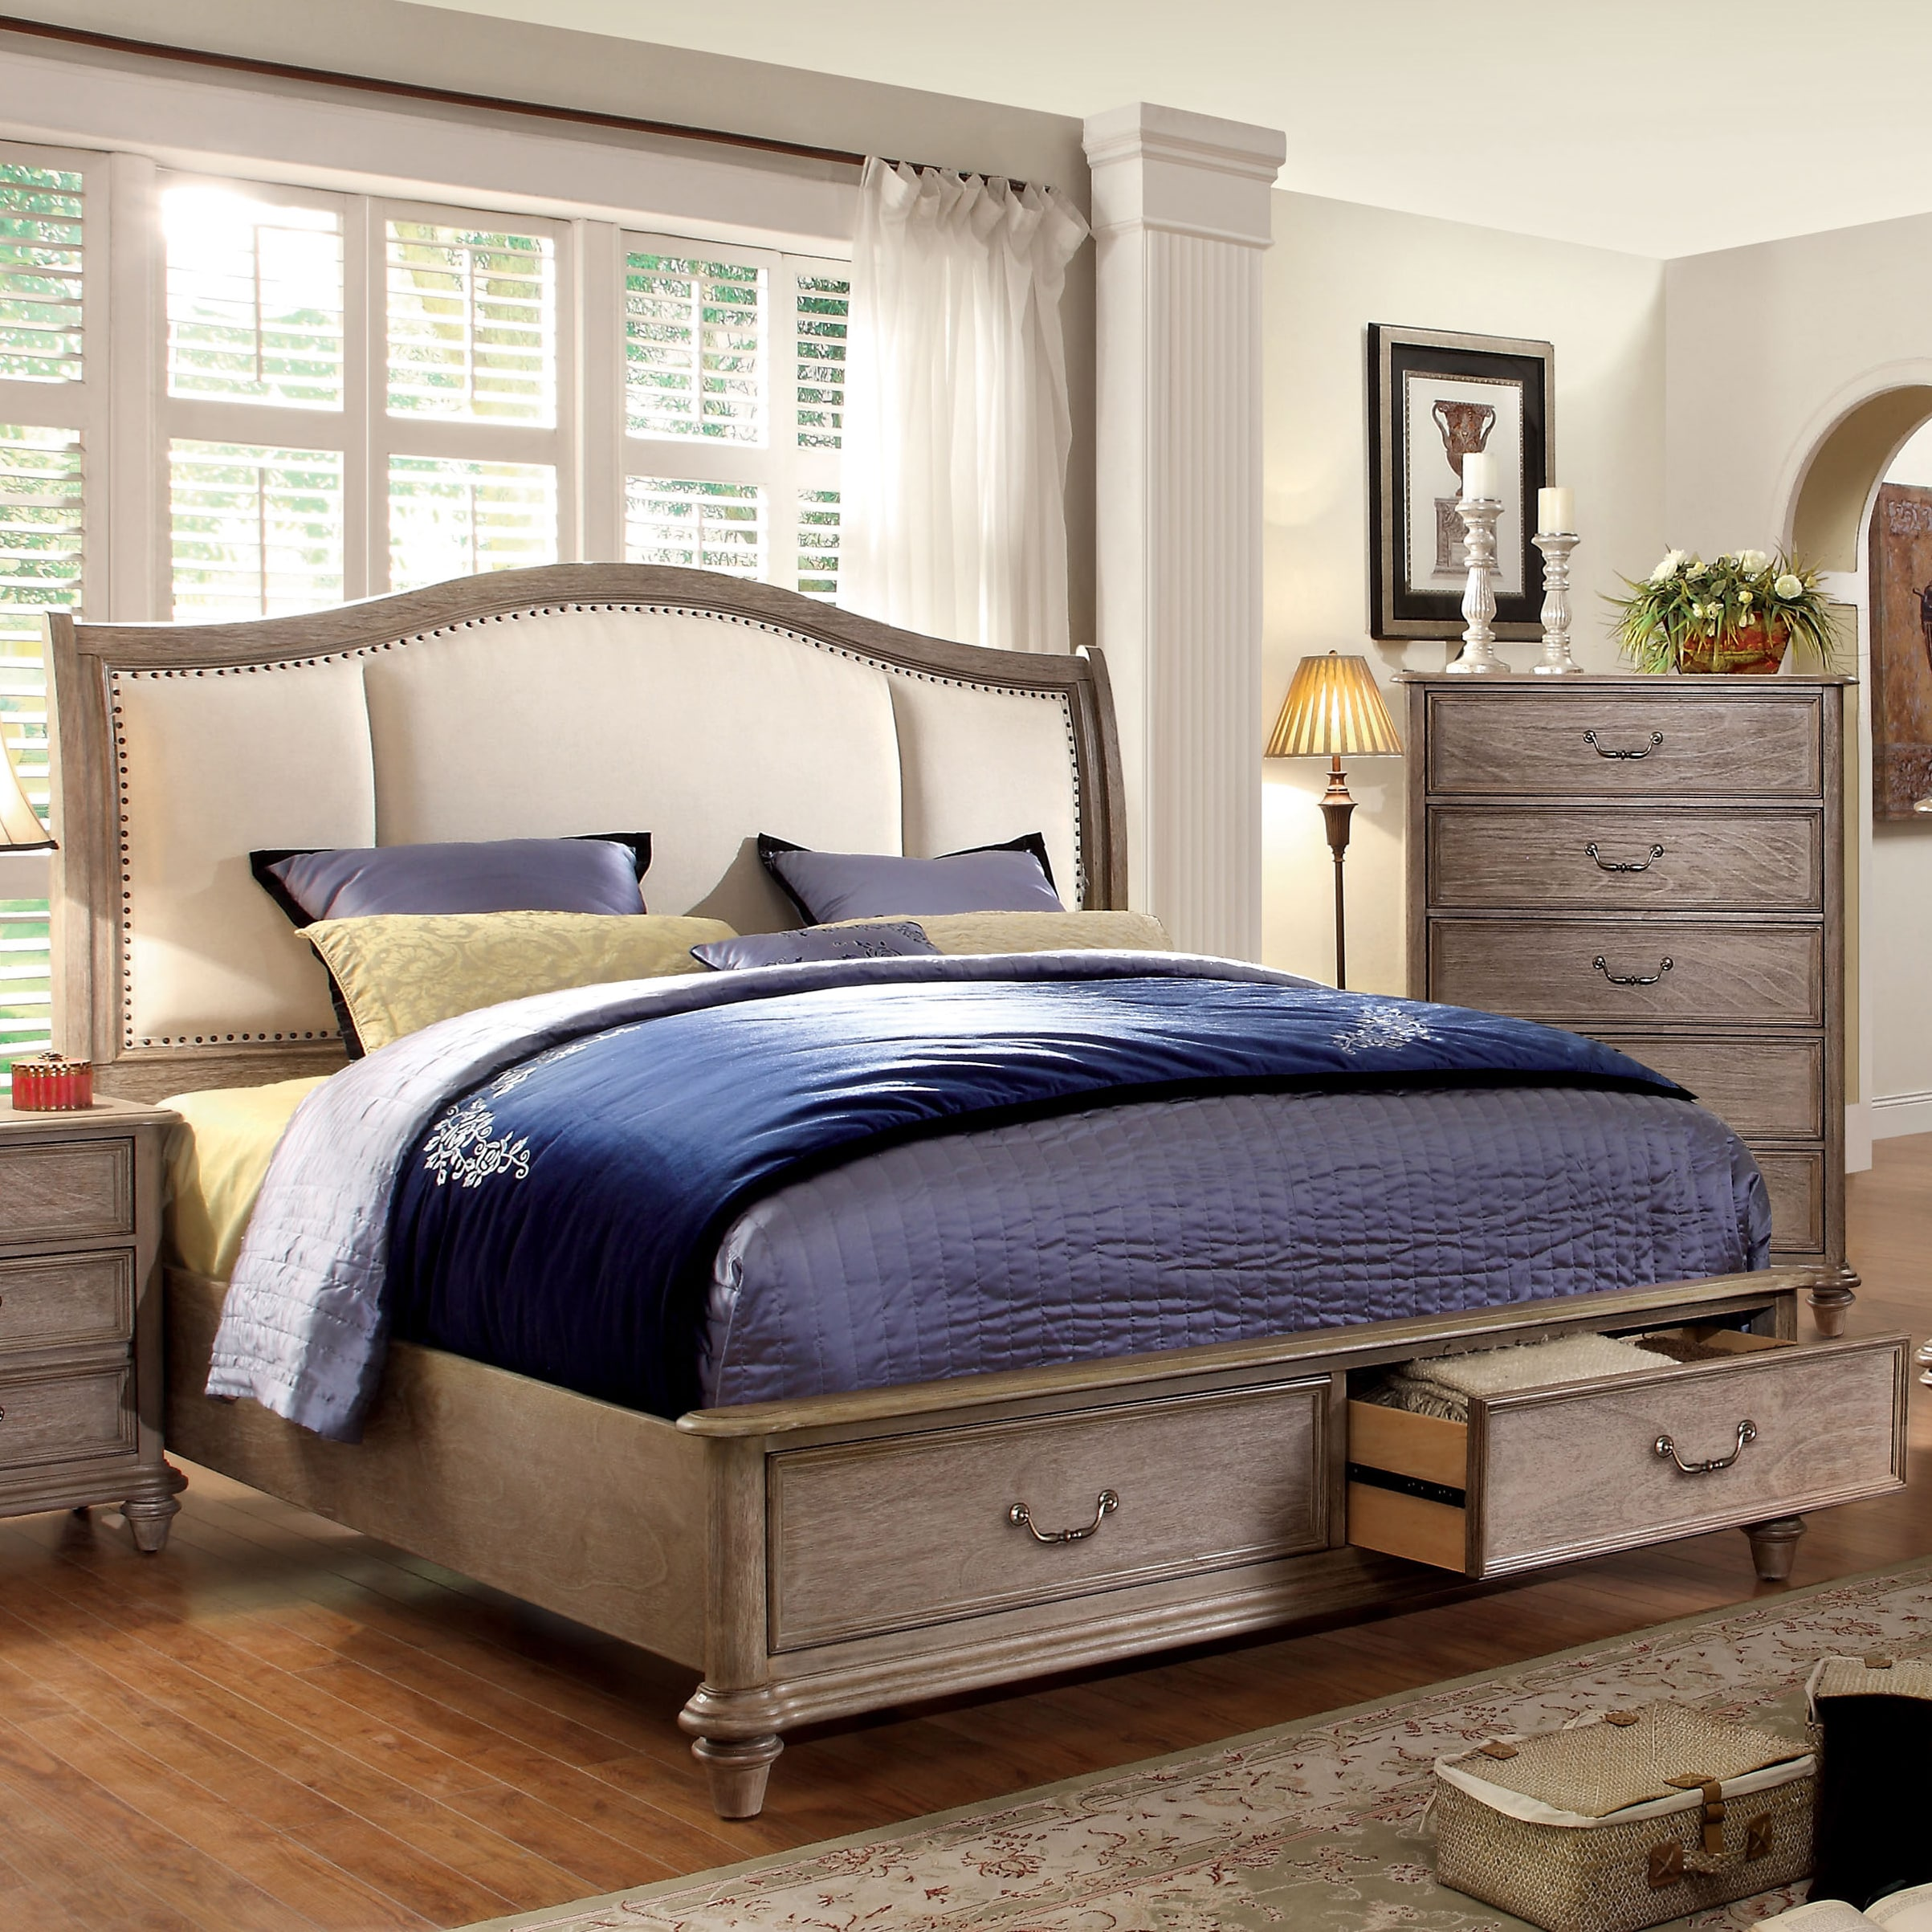 Shop Furniture Of America Minka Iv Rustic Grey Storage